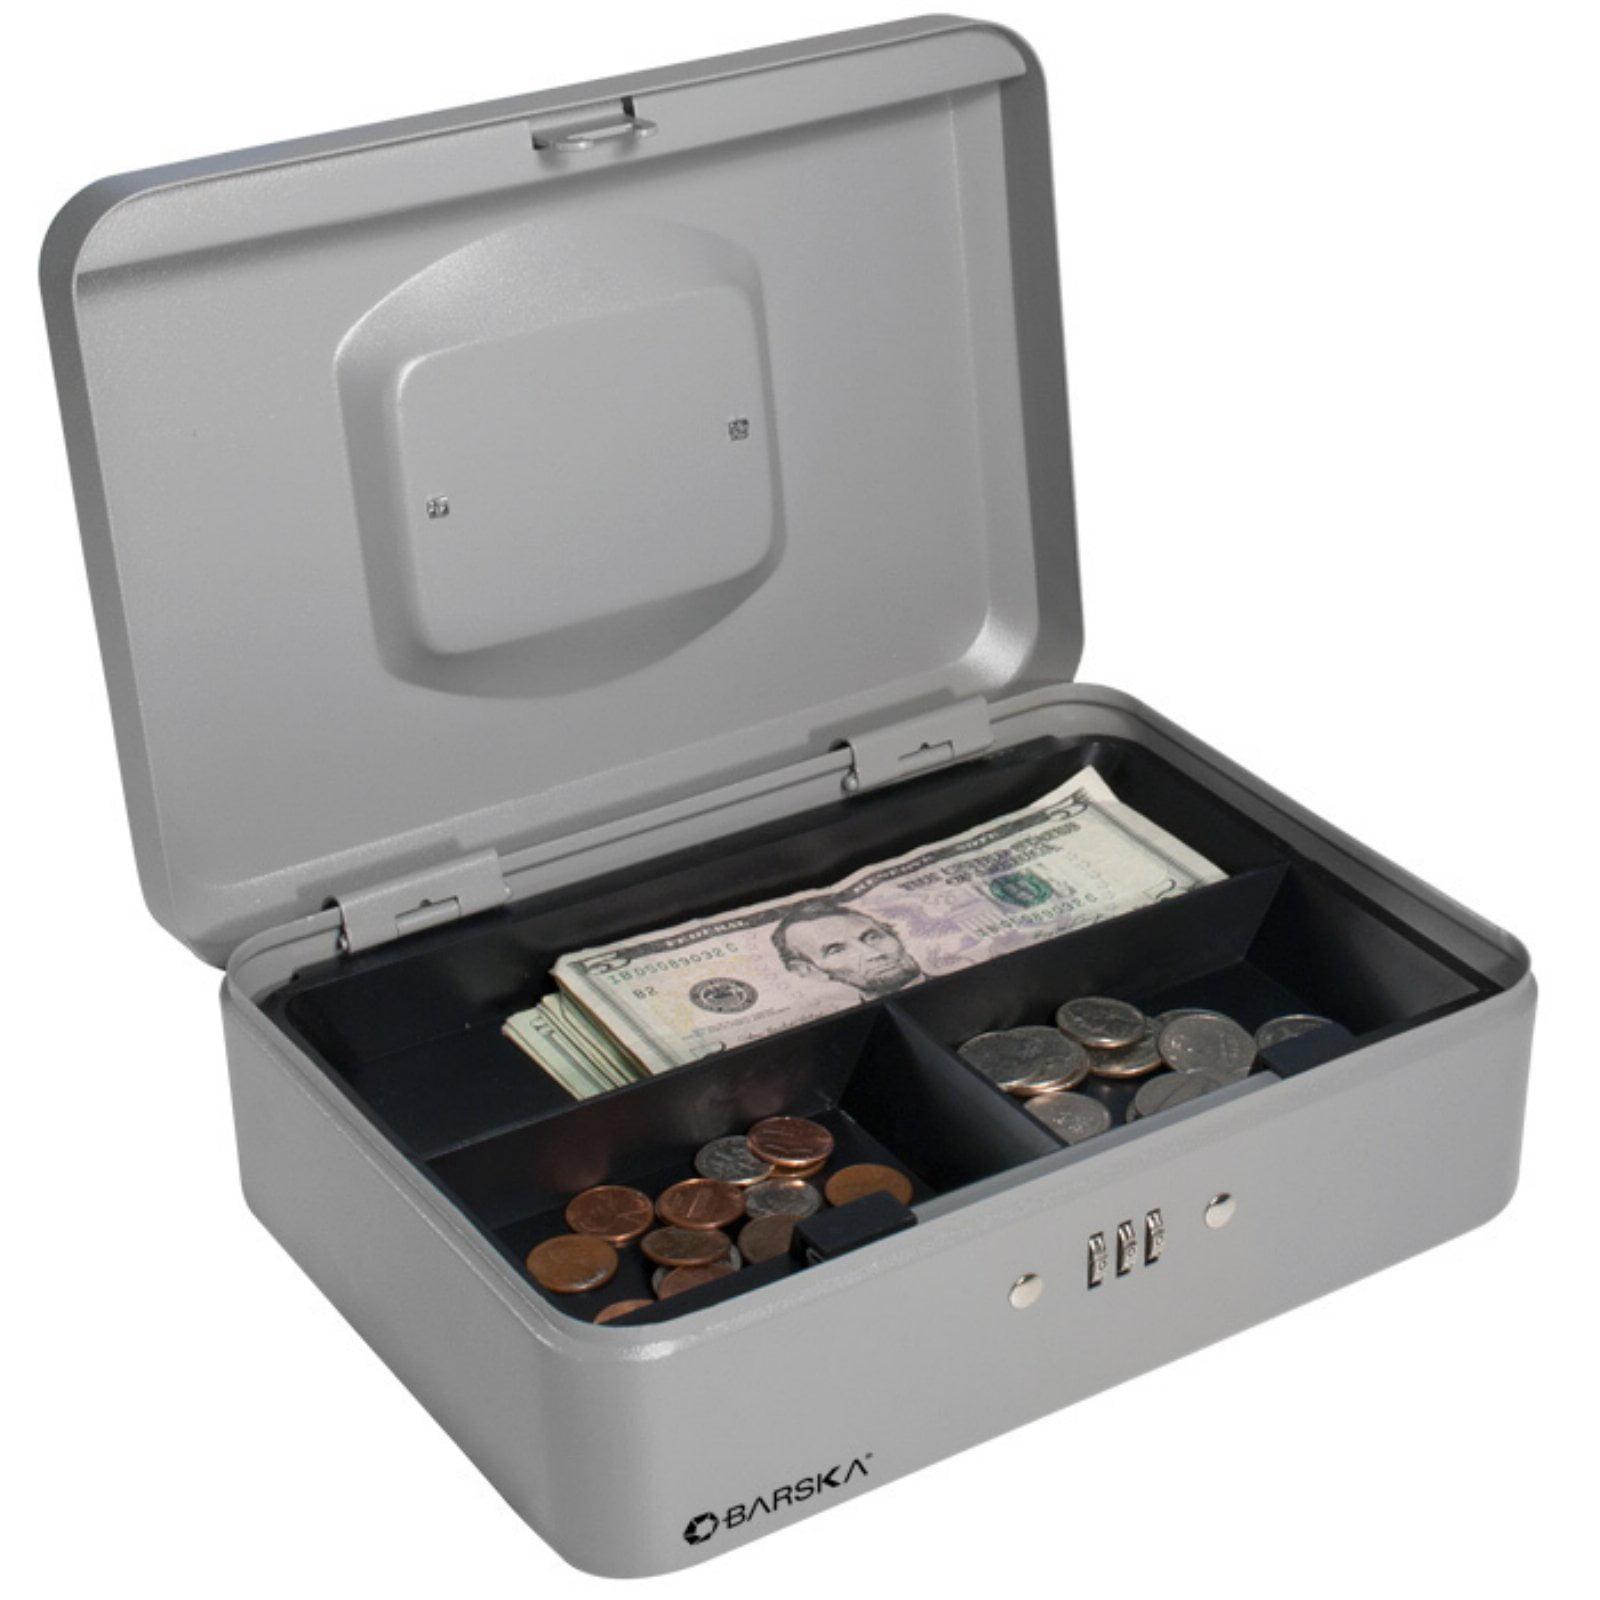 Barska 10 inch Cash Box with Combination Lock